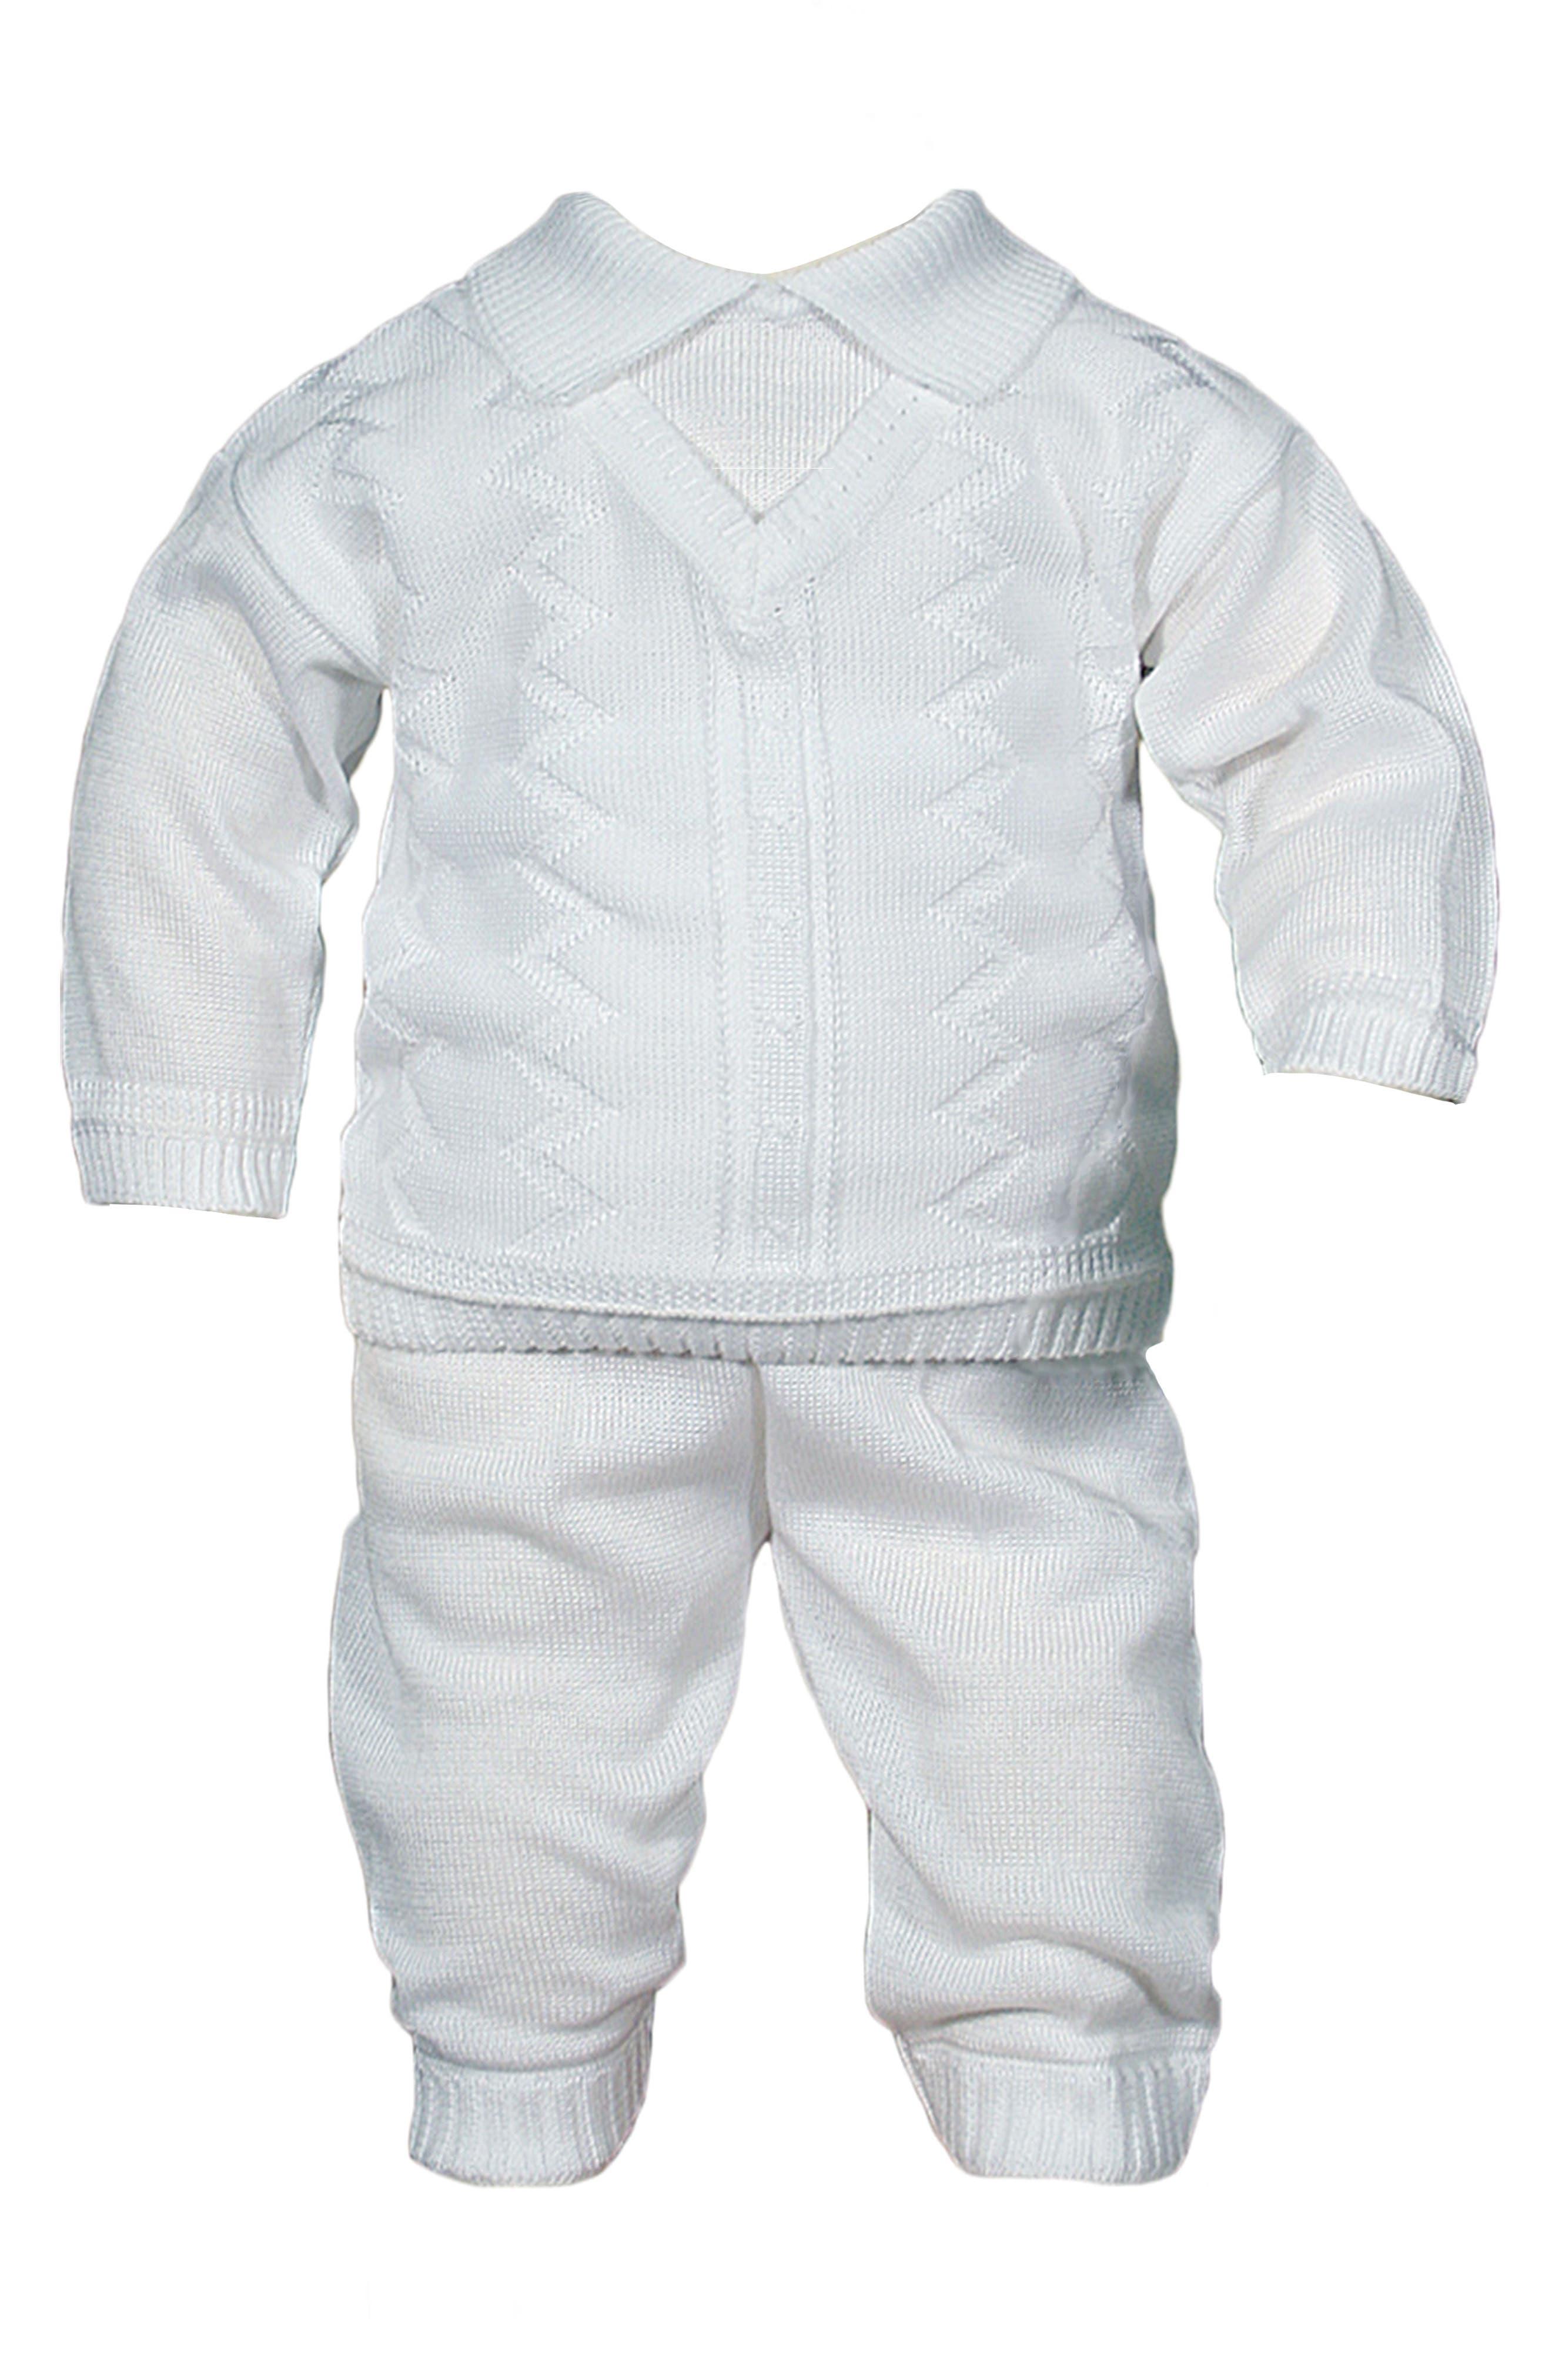 LITTLE THINGS MEAN A LOT,                             Knit Shirt & Pants Set,                             Main thumbnail 1, color,                             WHITE